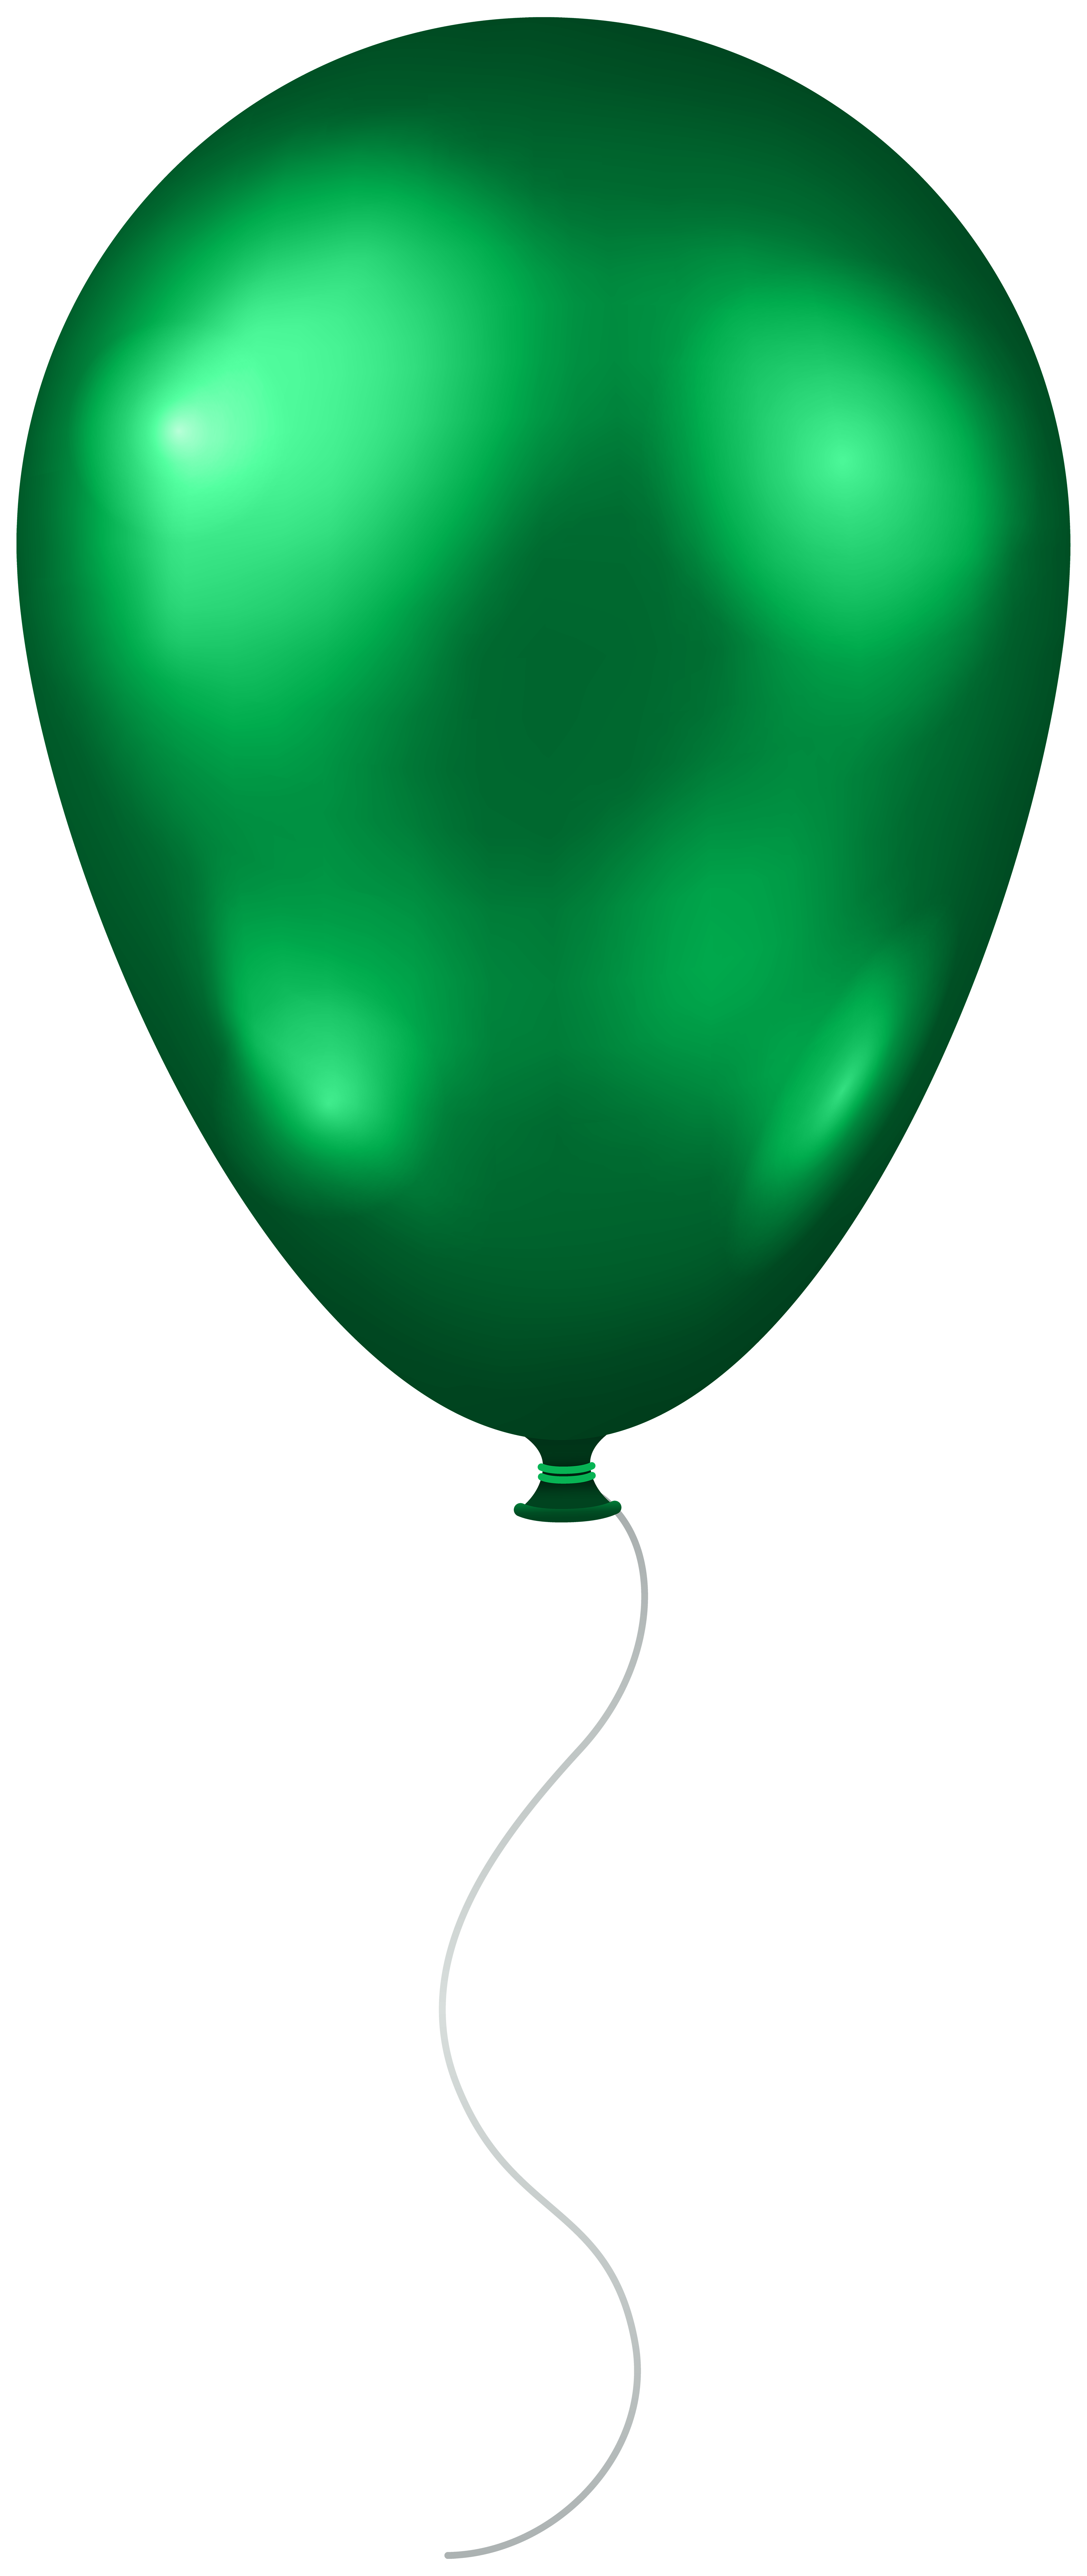 Green Balloon Transparent PNG Clip Art Image.